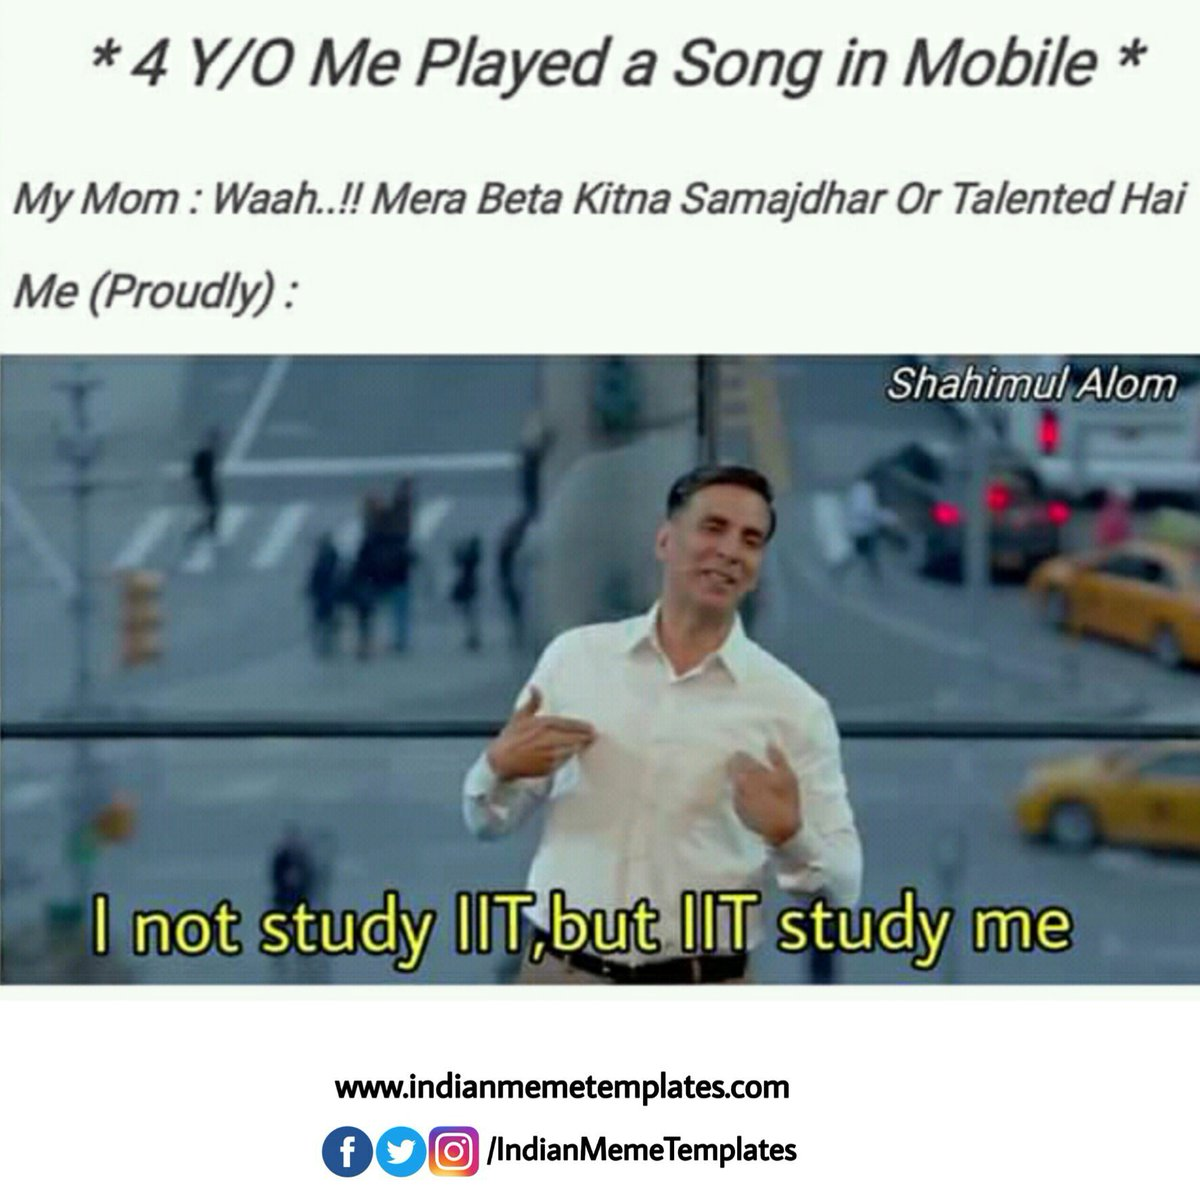 Indian Meme Templates On Twitter Meme Memes Memetemplates